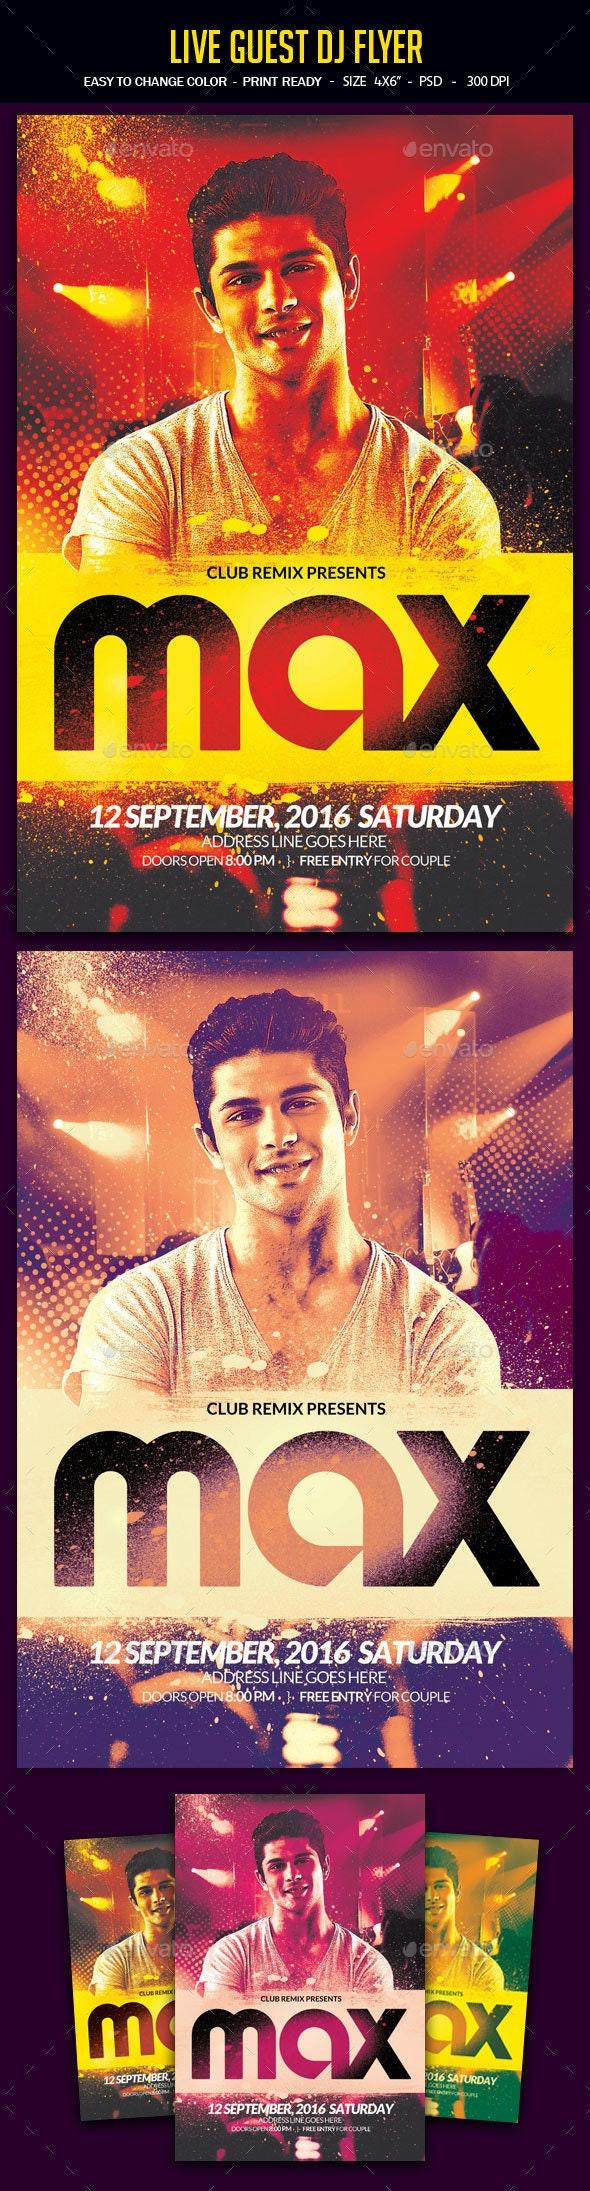 Live Guest Dj Flyer - Clubs & Parties Events